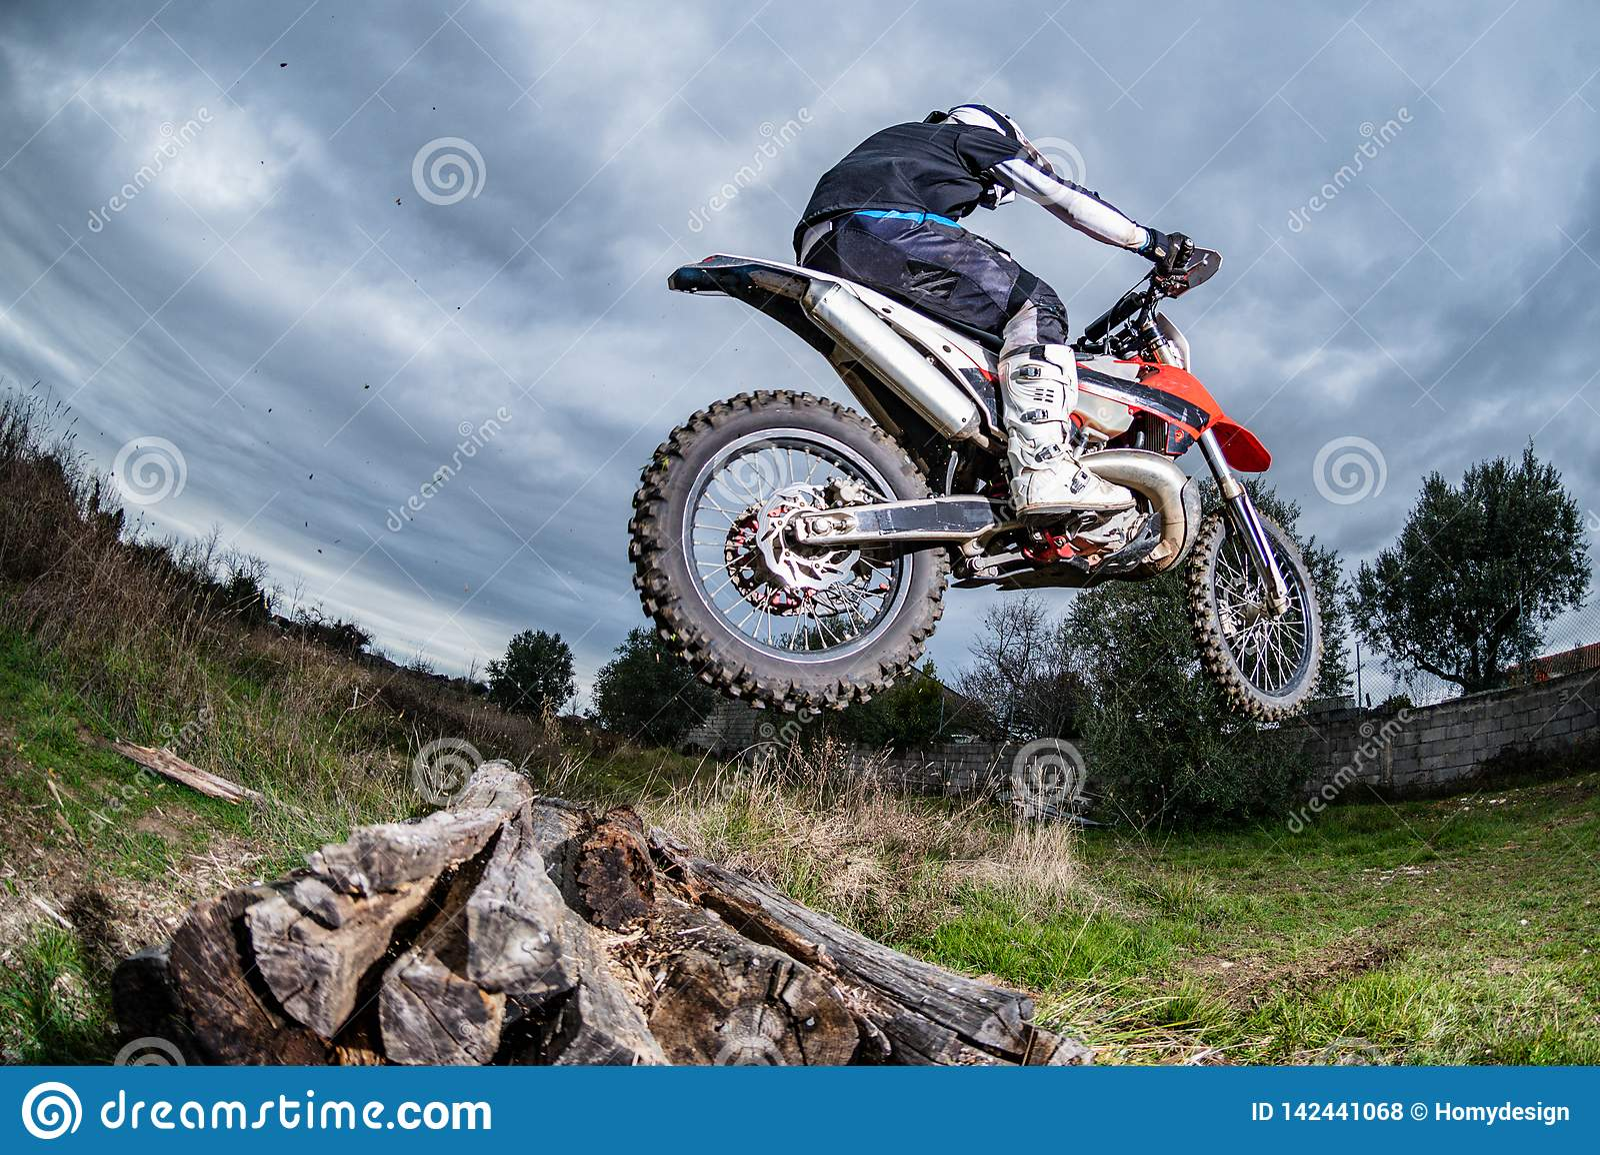 Man on muddy motocross scrambling motorcycle riding